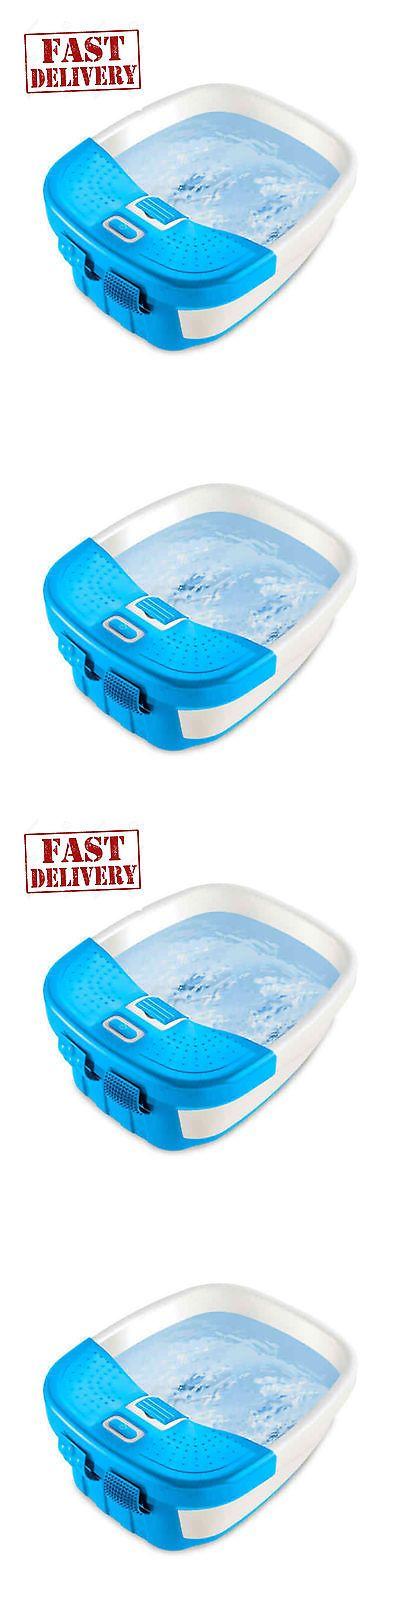 Massagers: Foot Spa Massager Heat Massage Bubbles Bath Waterfall Feet Water Relax Pedicure BUY IT NOW ONLY: $34.75